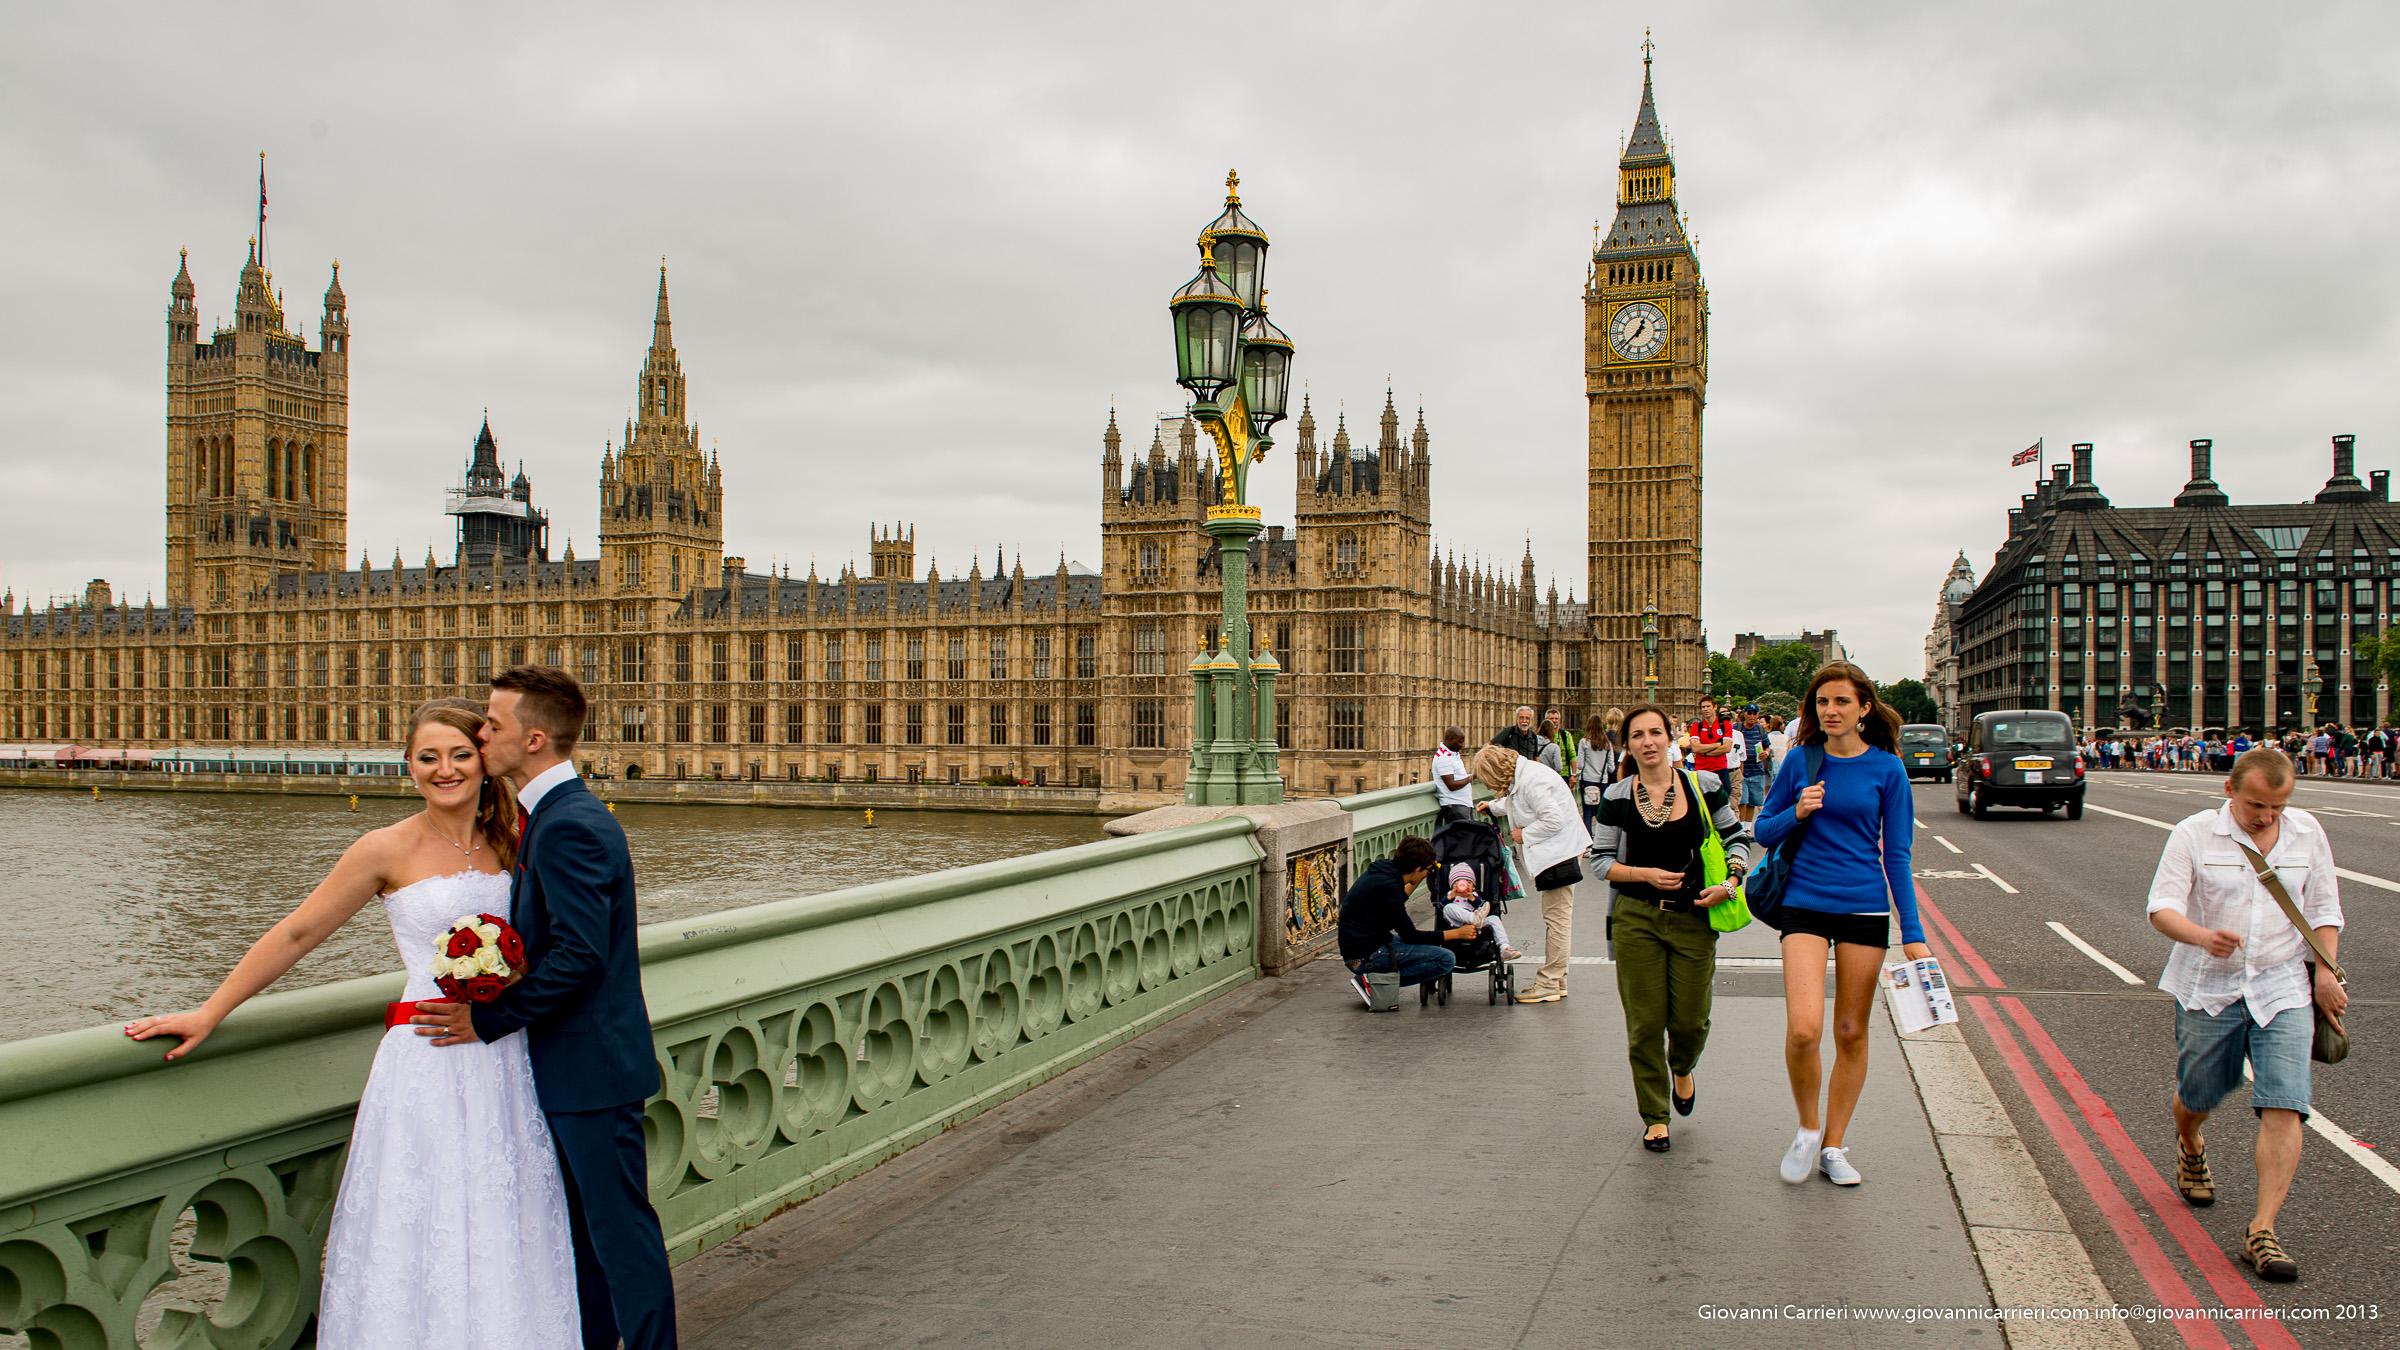 Il Big Ben ed il Palazzo di Westminster - Londra